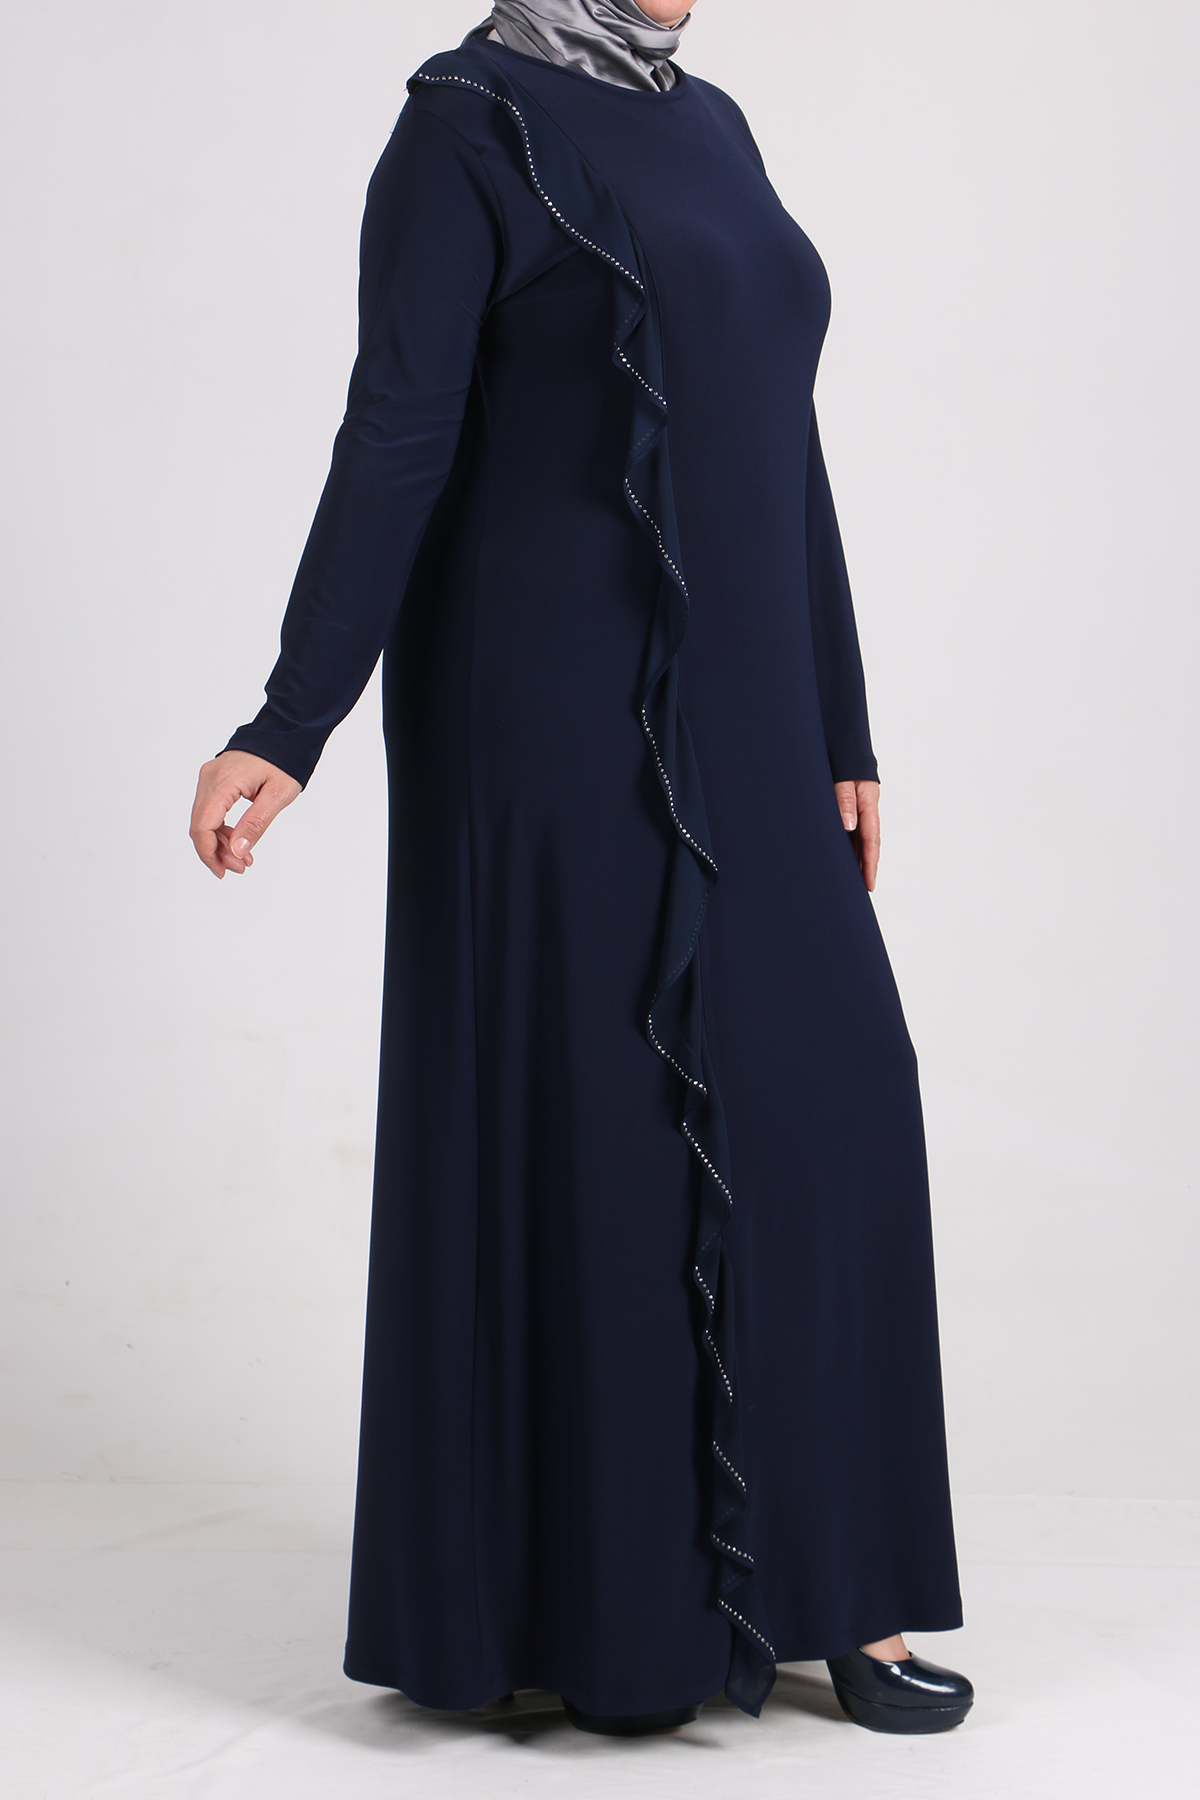 2087 Plus Size Flounced Dress - Navy Blue